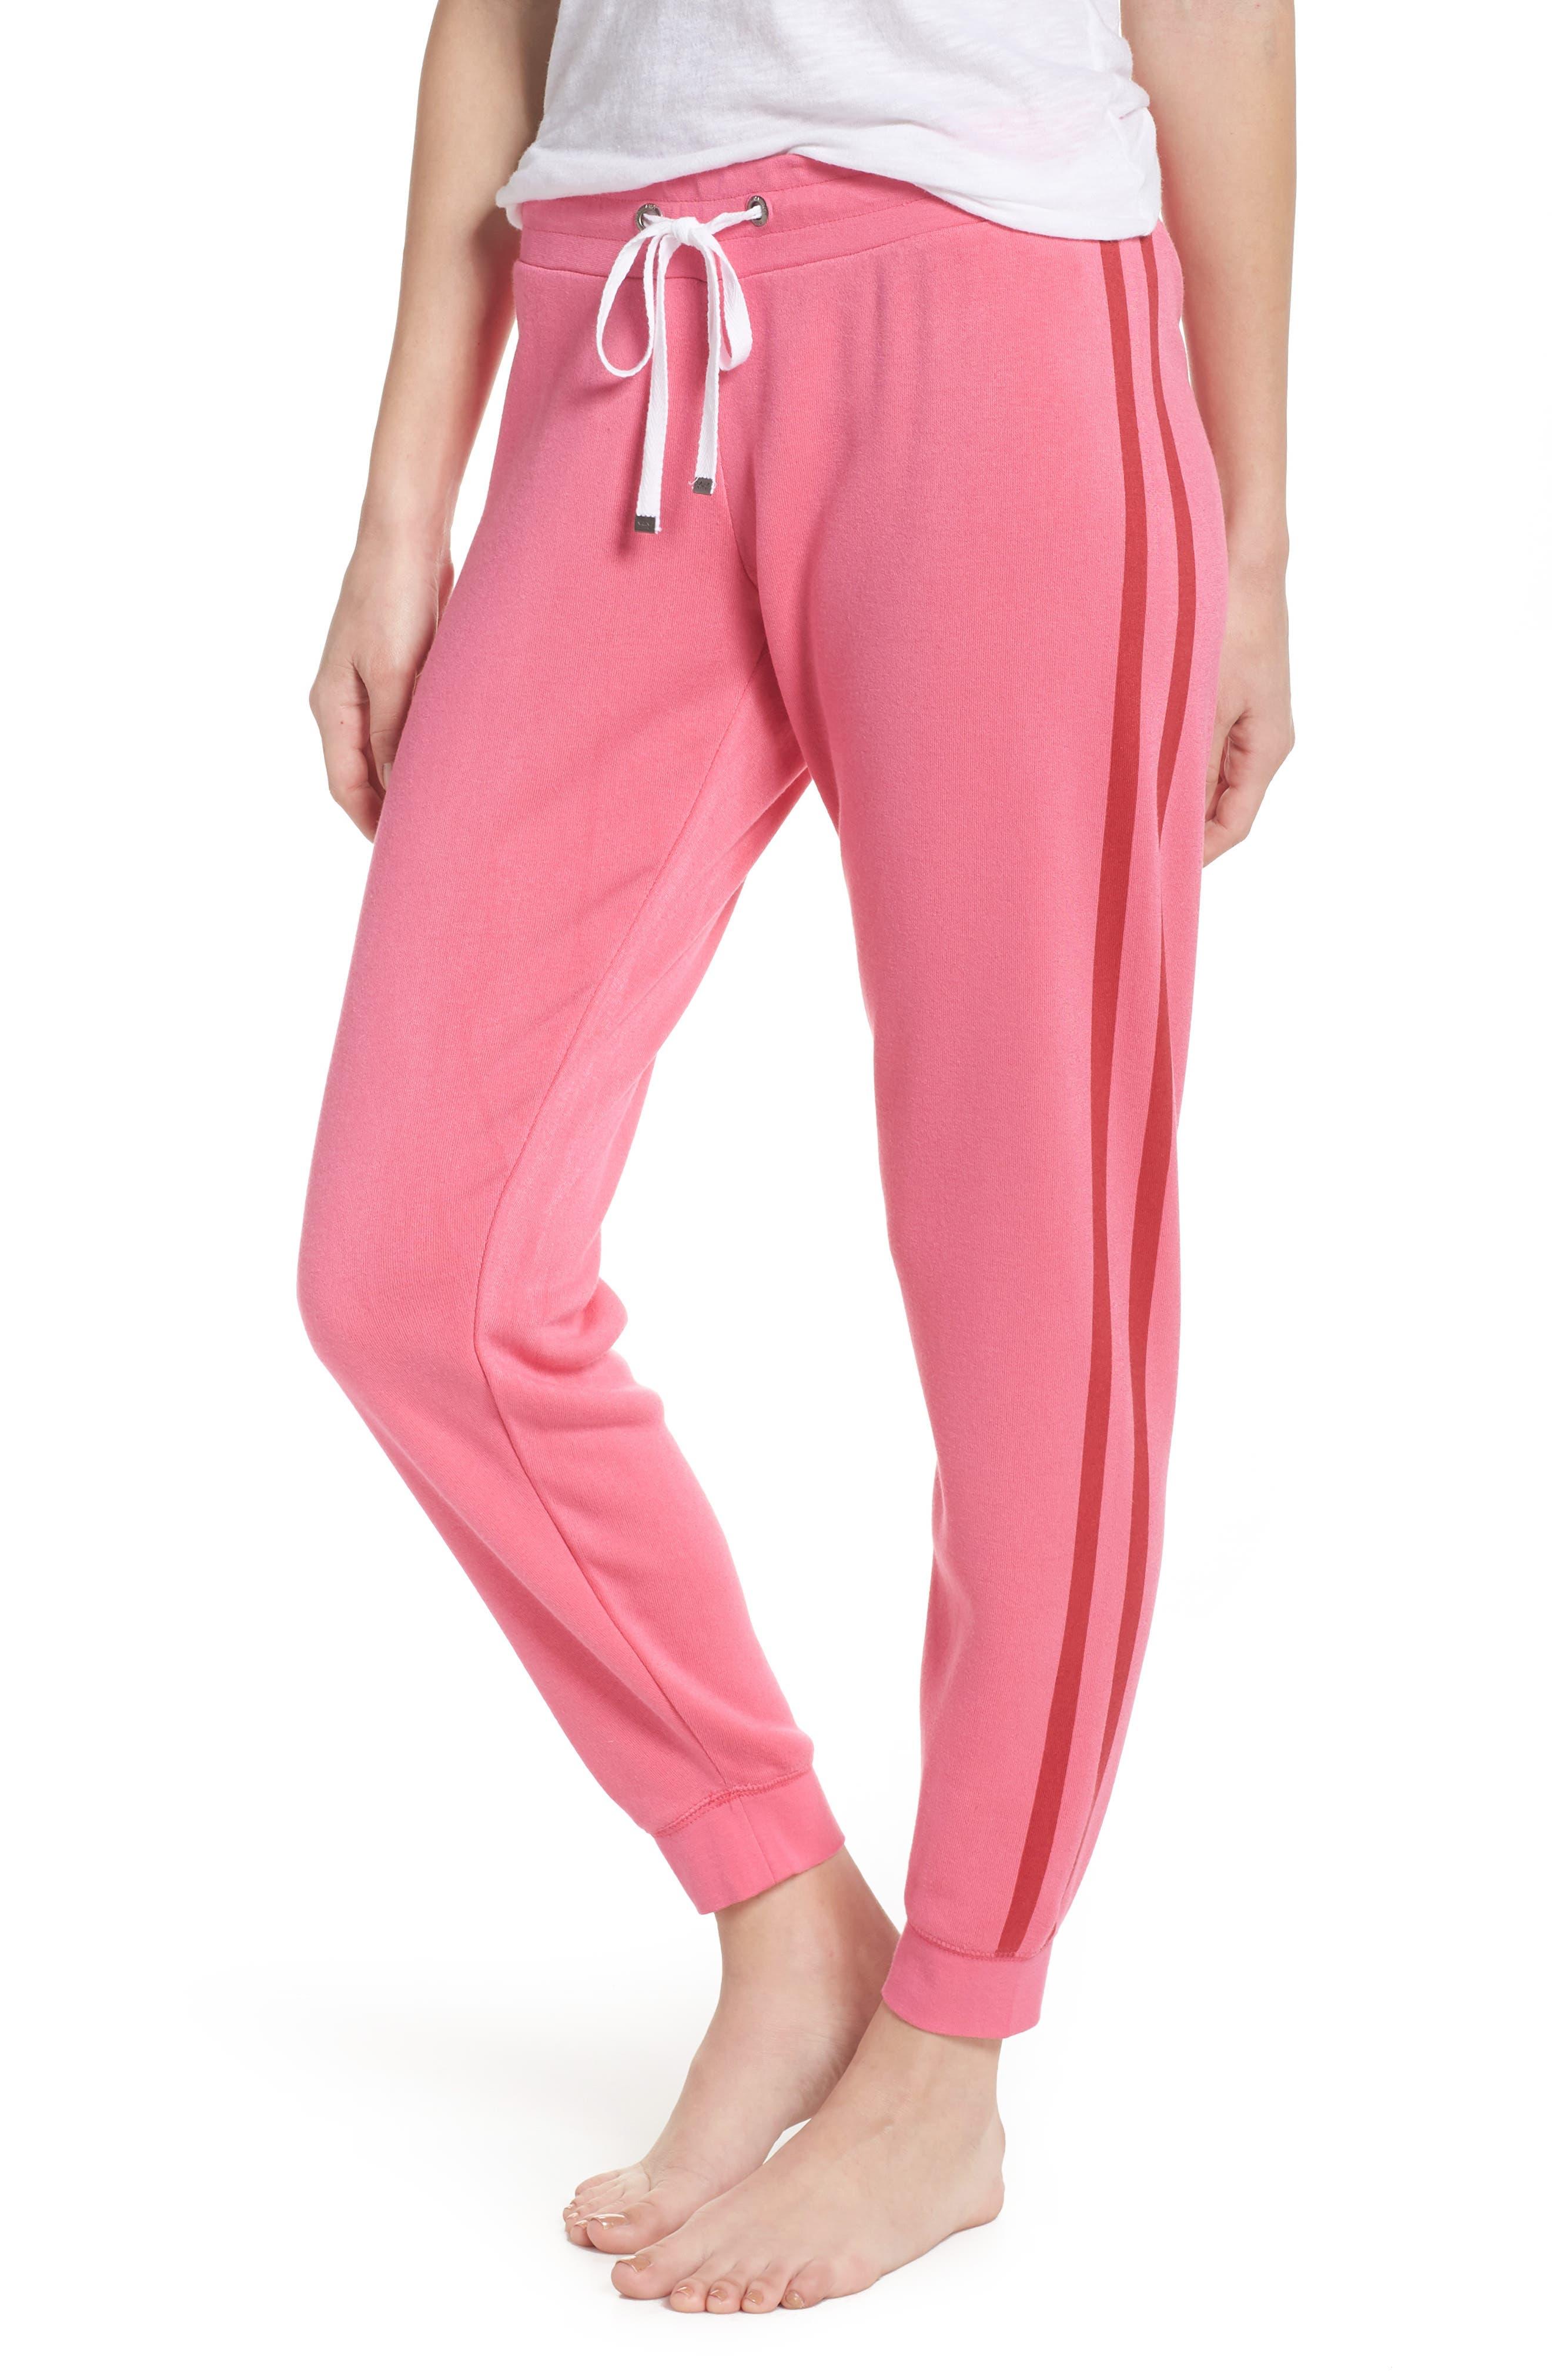 Firecracker Jogger Pajama Pants,                             Main thumbnail 1, color,                             Pink Fandango